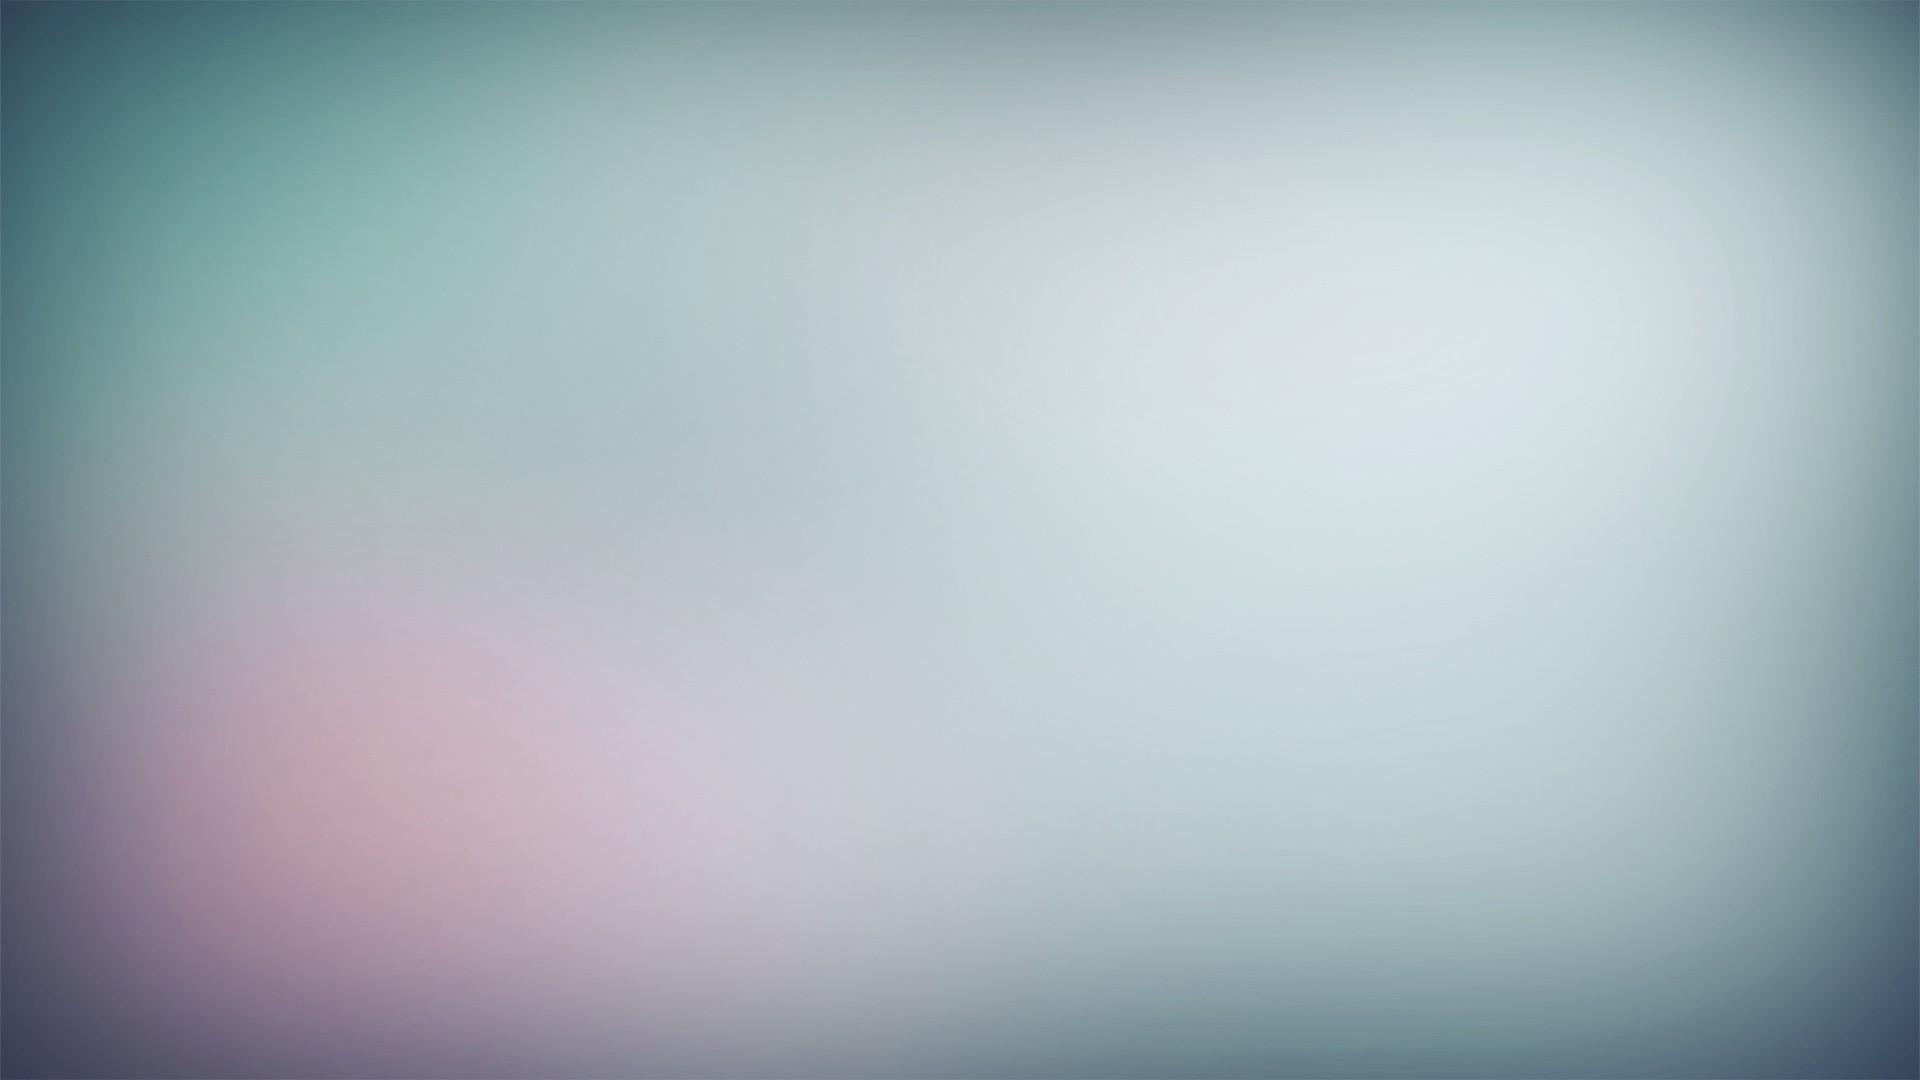 gaussian-blur.jpg